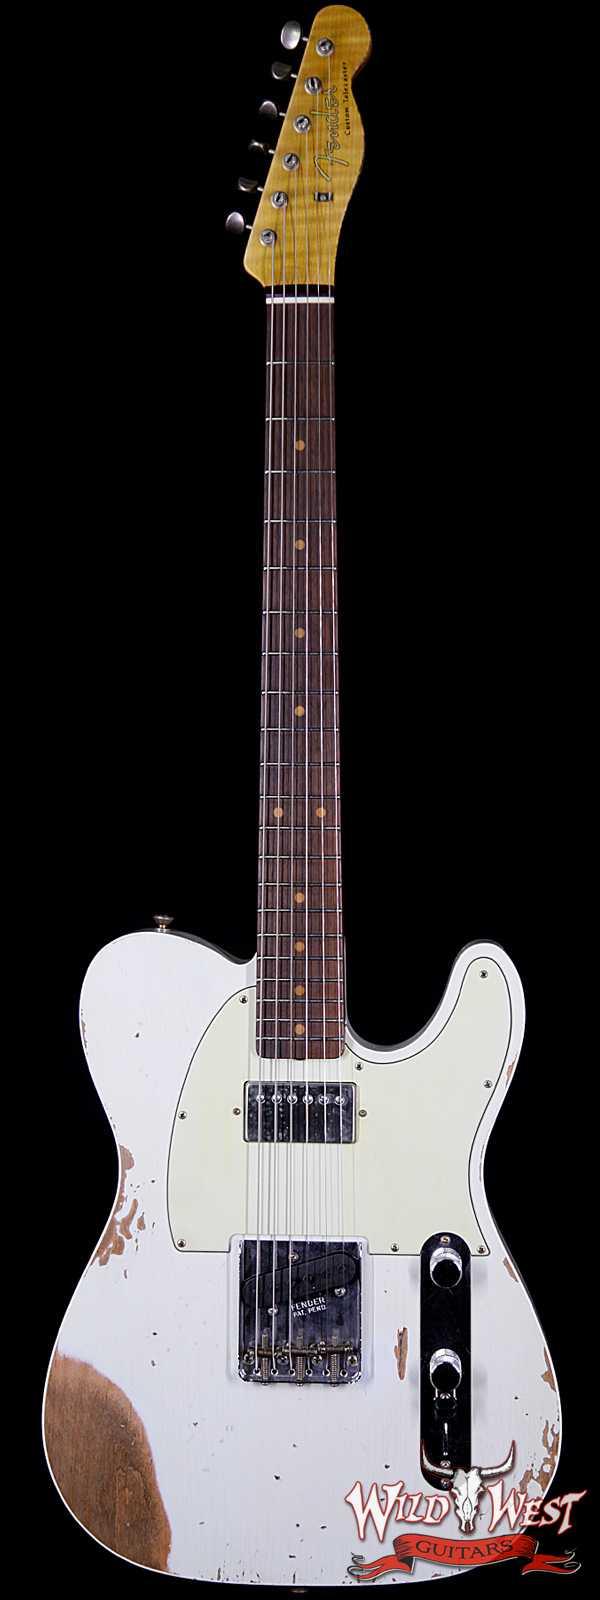 Fender Custom Shop Super Faded Aged 60's Telecaster Custom HS Flame Neck Heavy Relic Sonic Blue